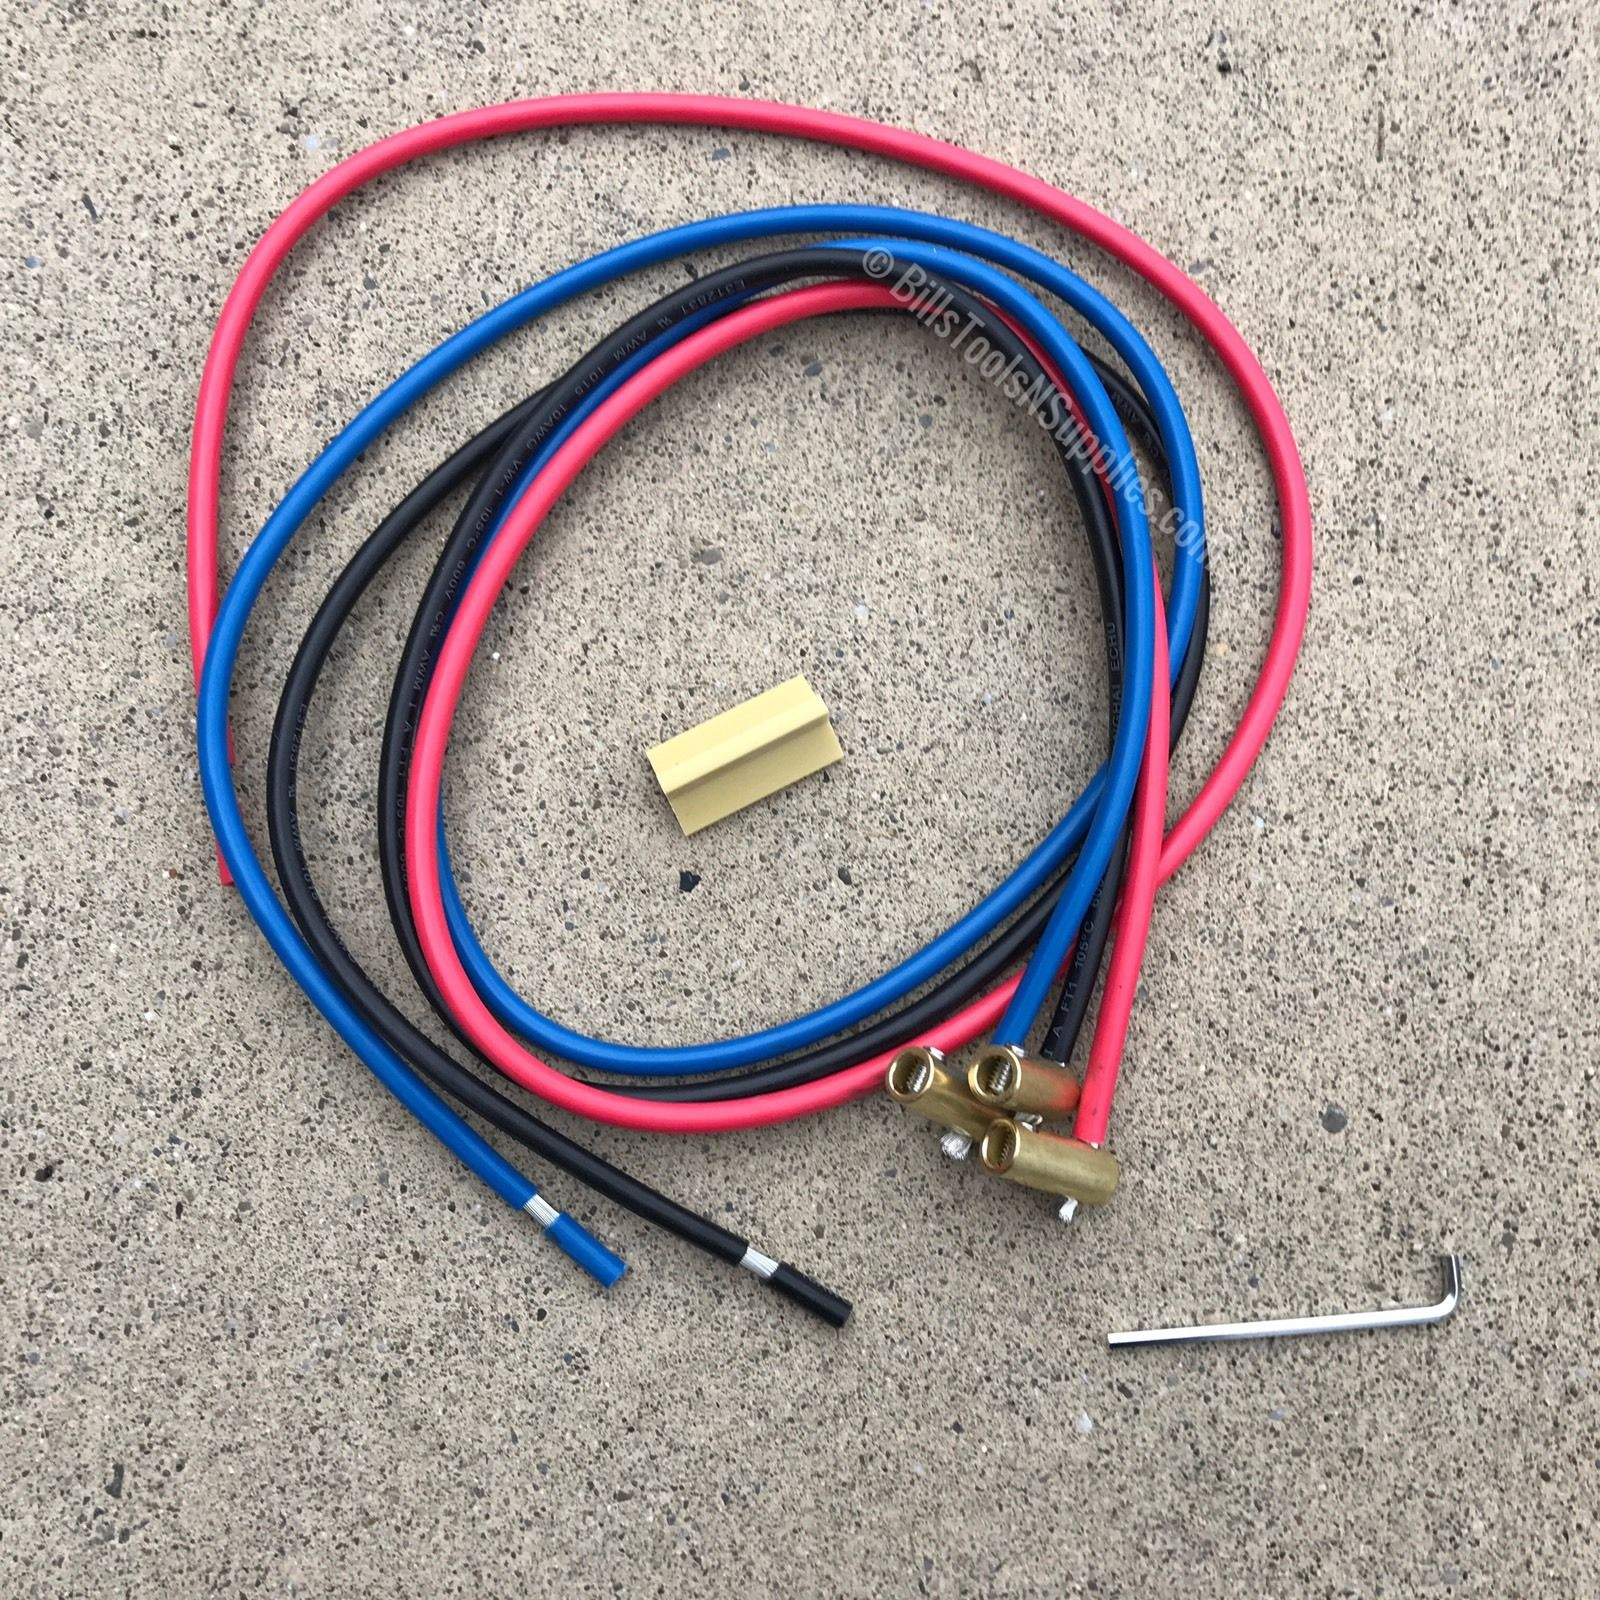 Compressor Terminal Repair Kit DIVERSITECH 3- 8 Gauge Wire, TLC-3-8 ...